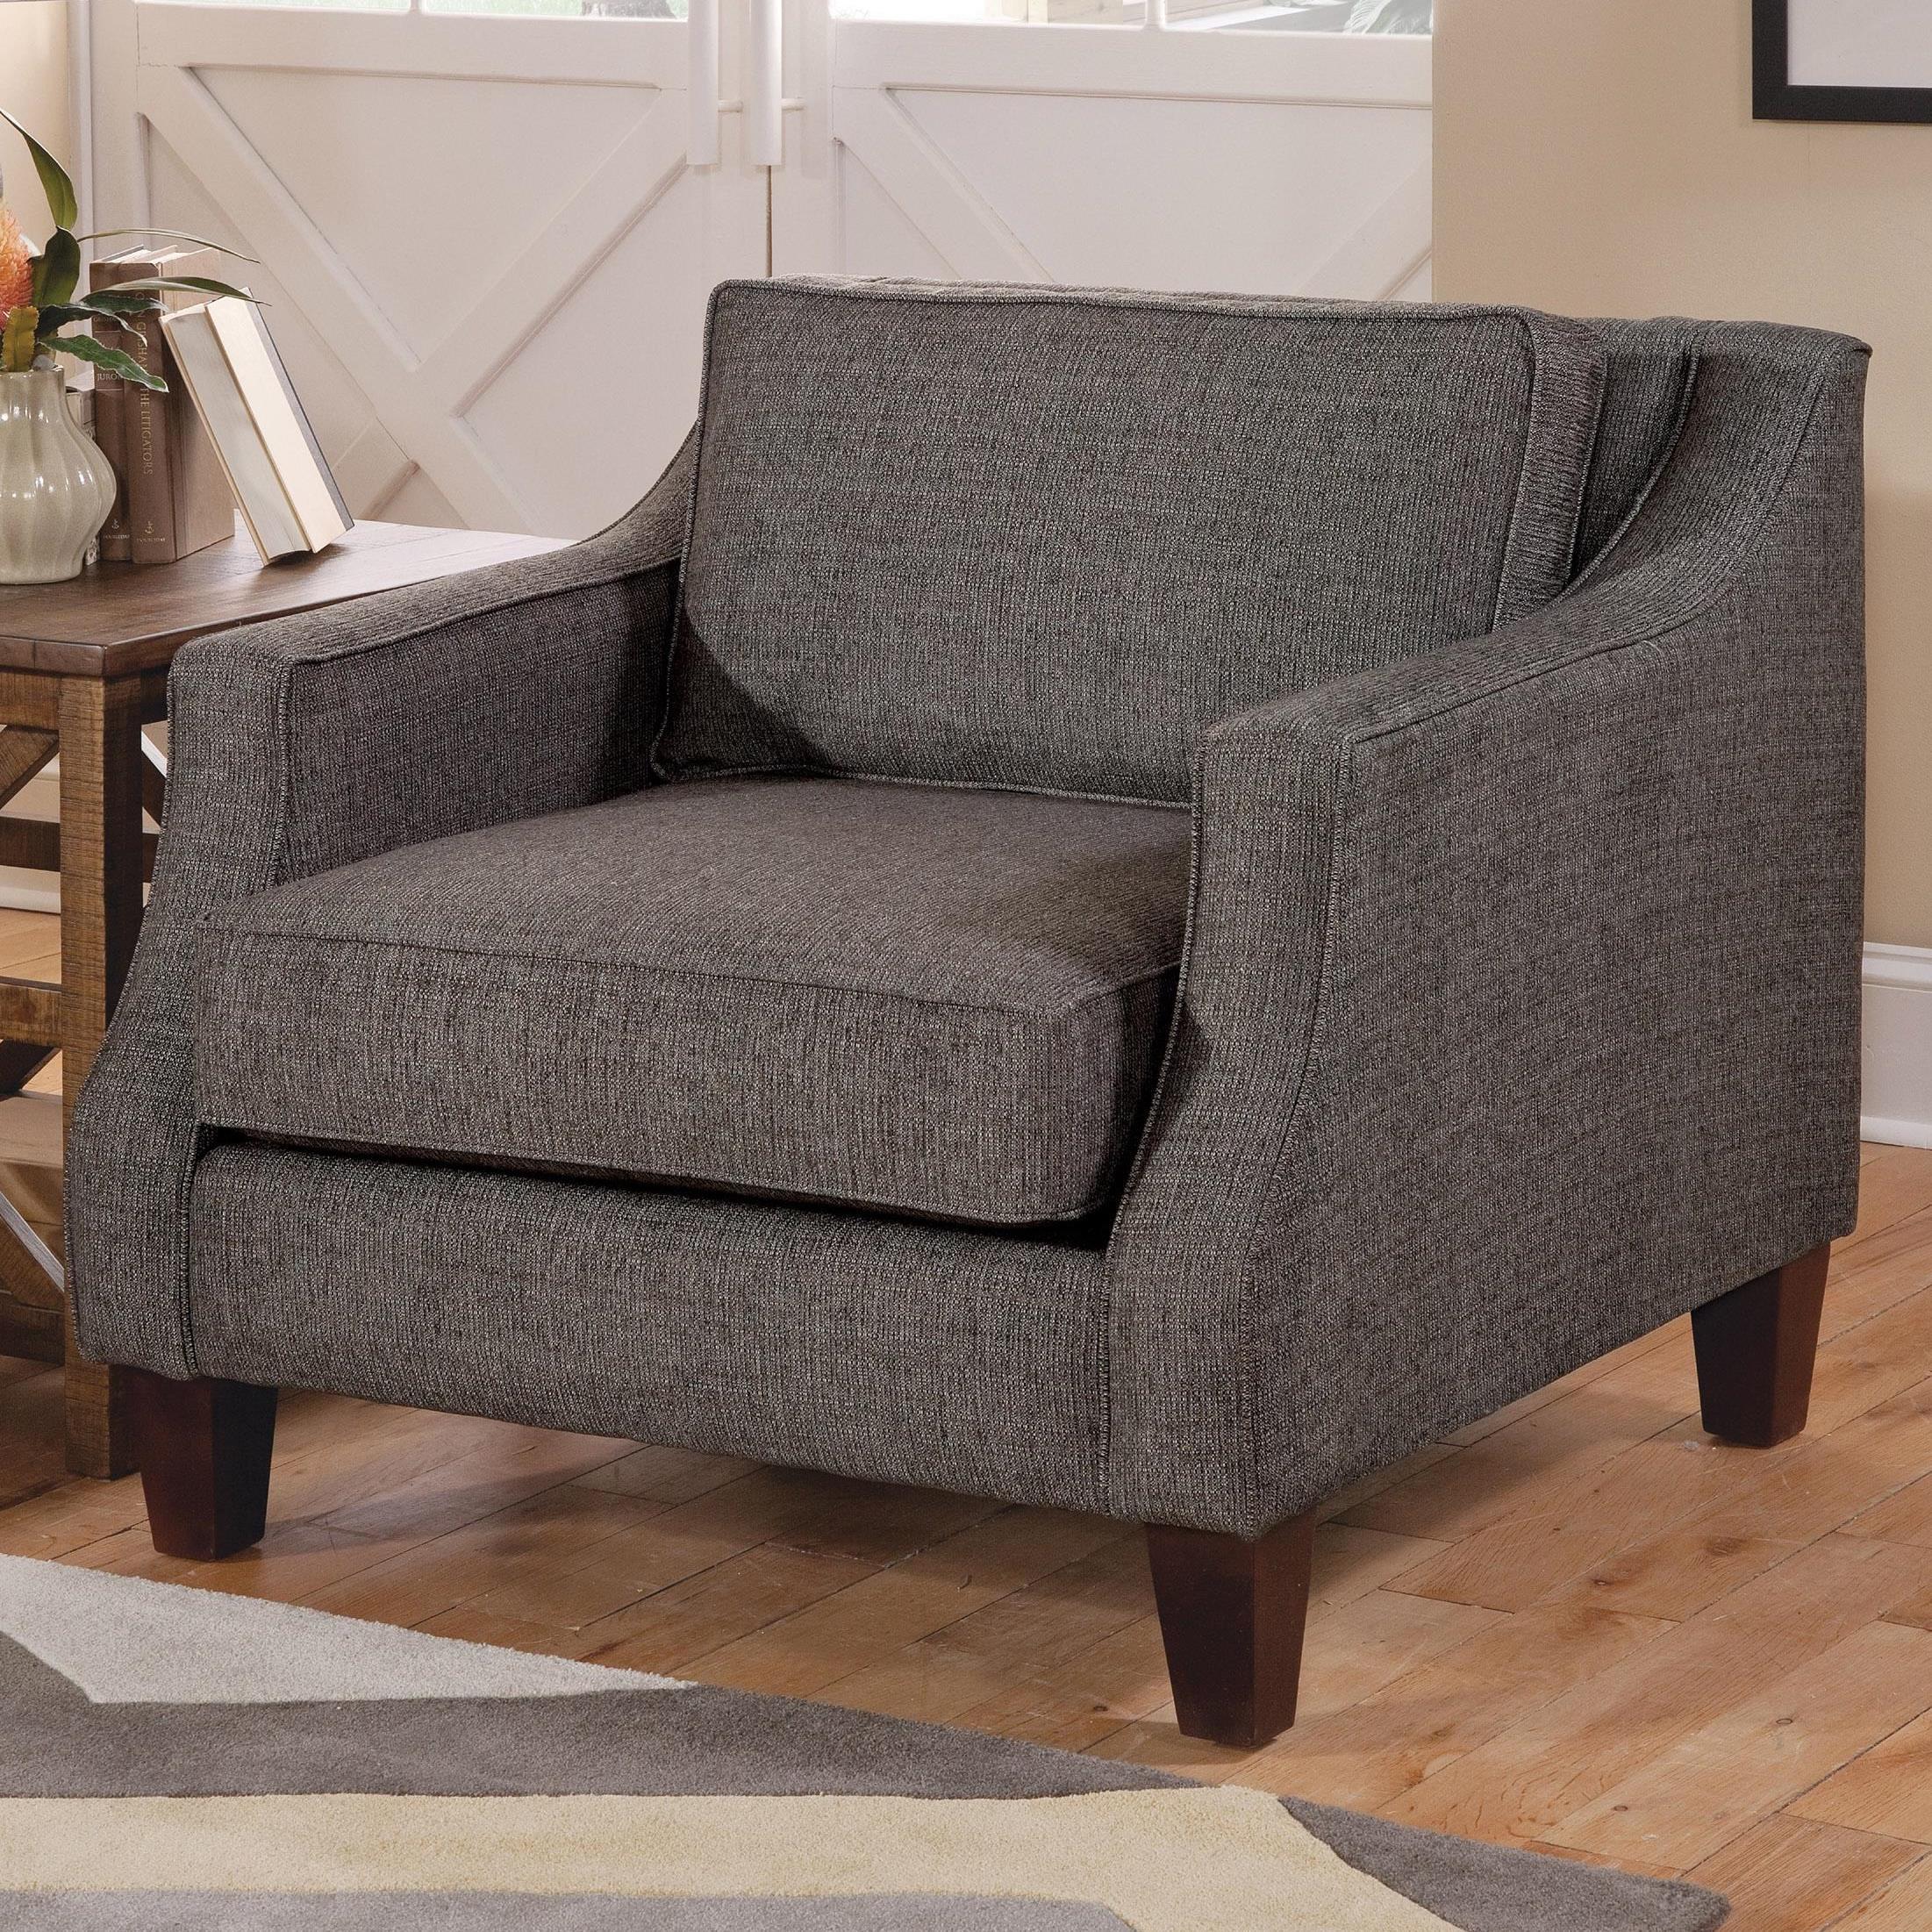 Belfort Essentials Emmett Chair - Item Number: 8600-10-Charcoal